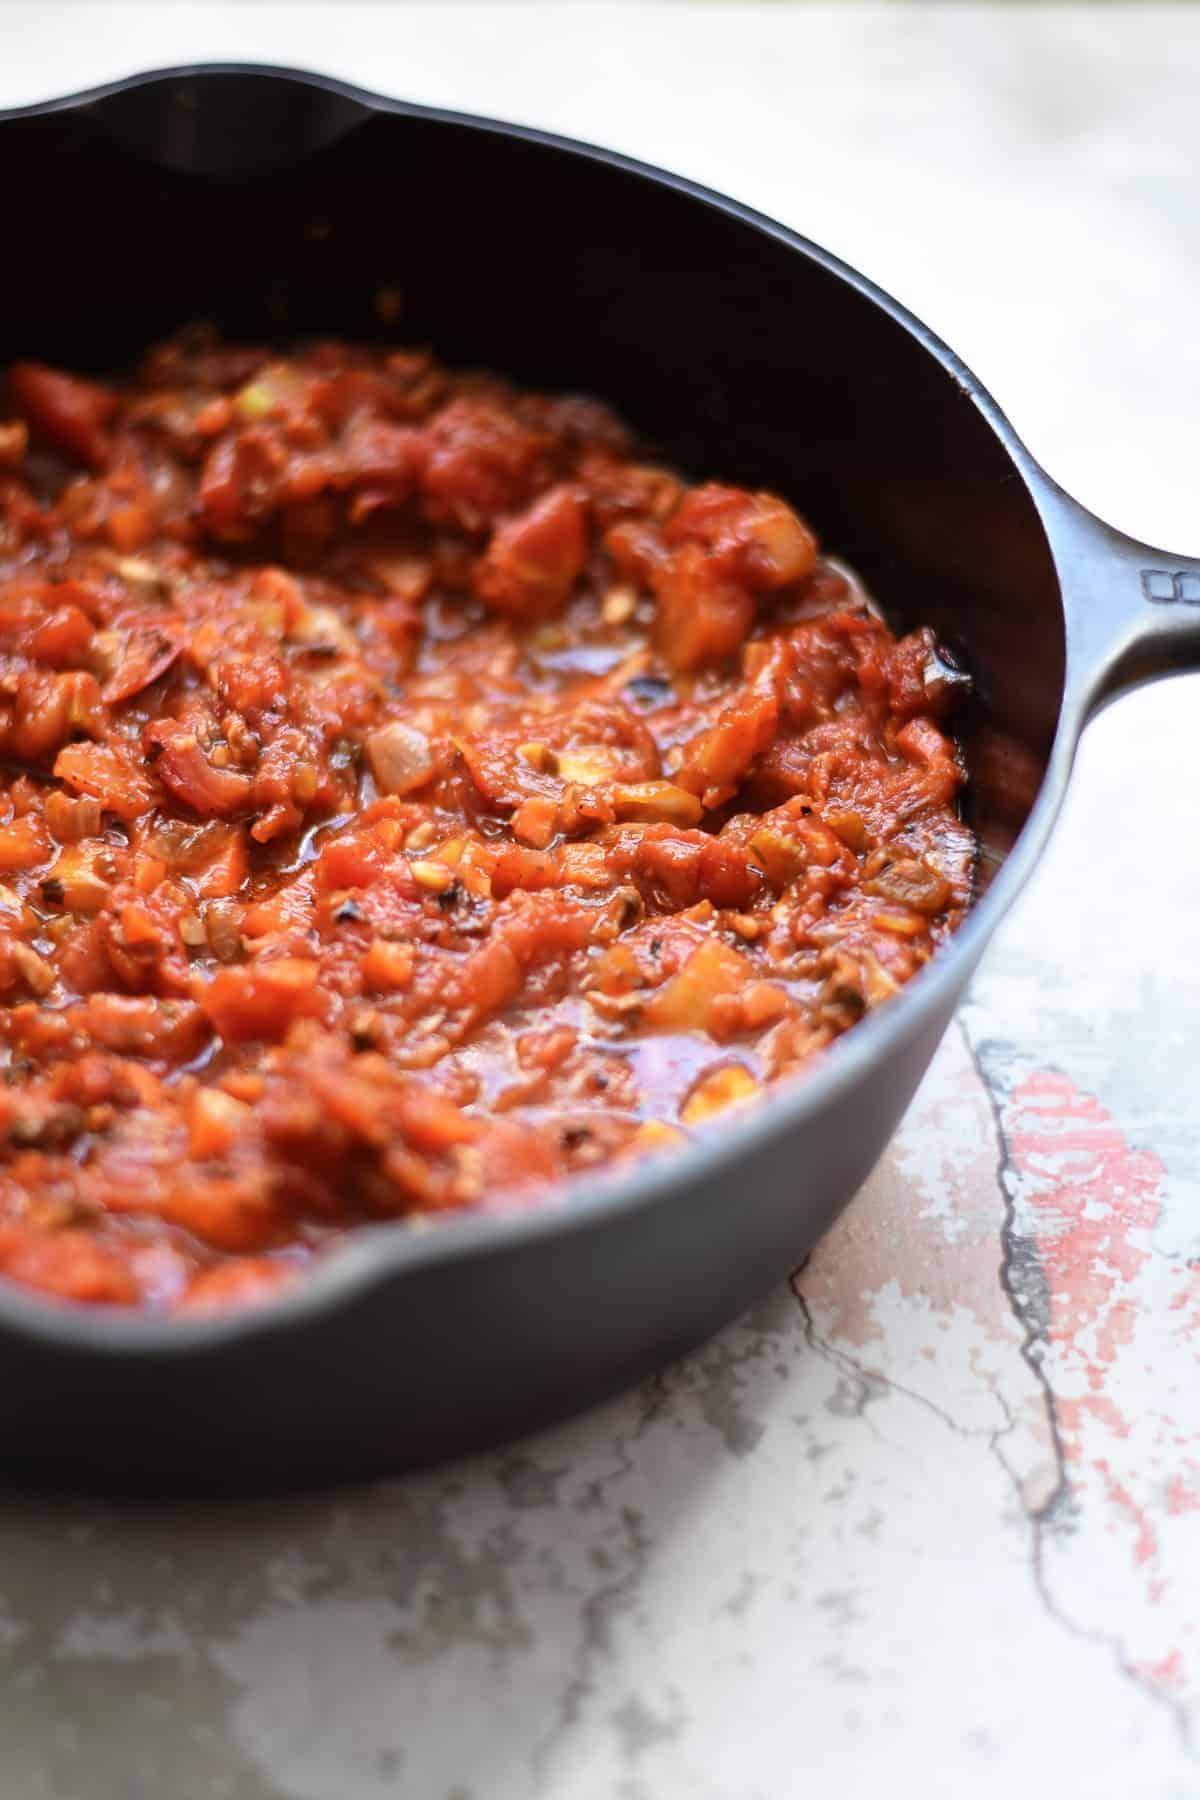 Garden Vegetable Homemade Tomato Sauce